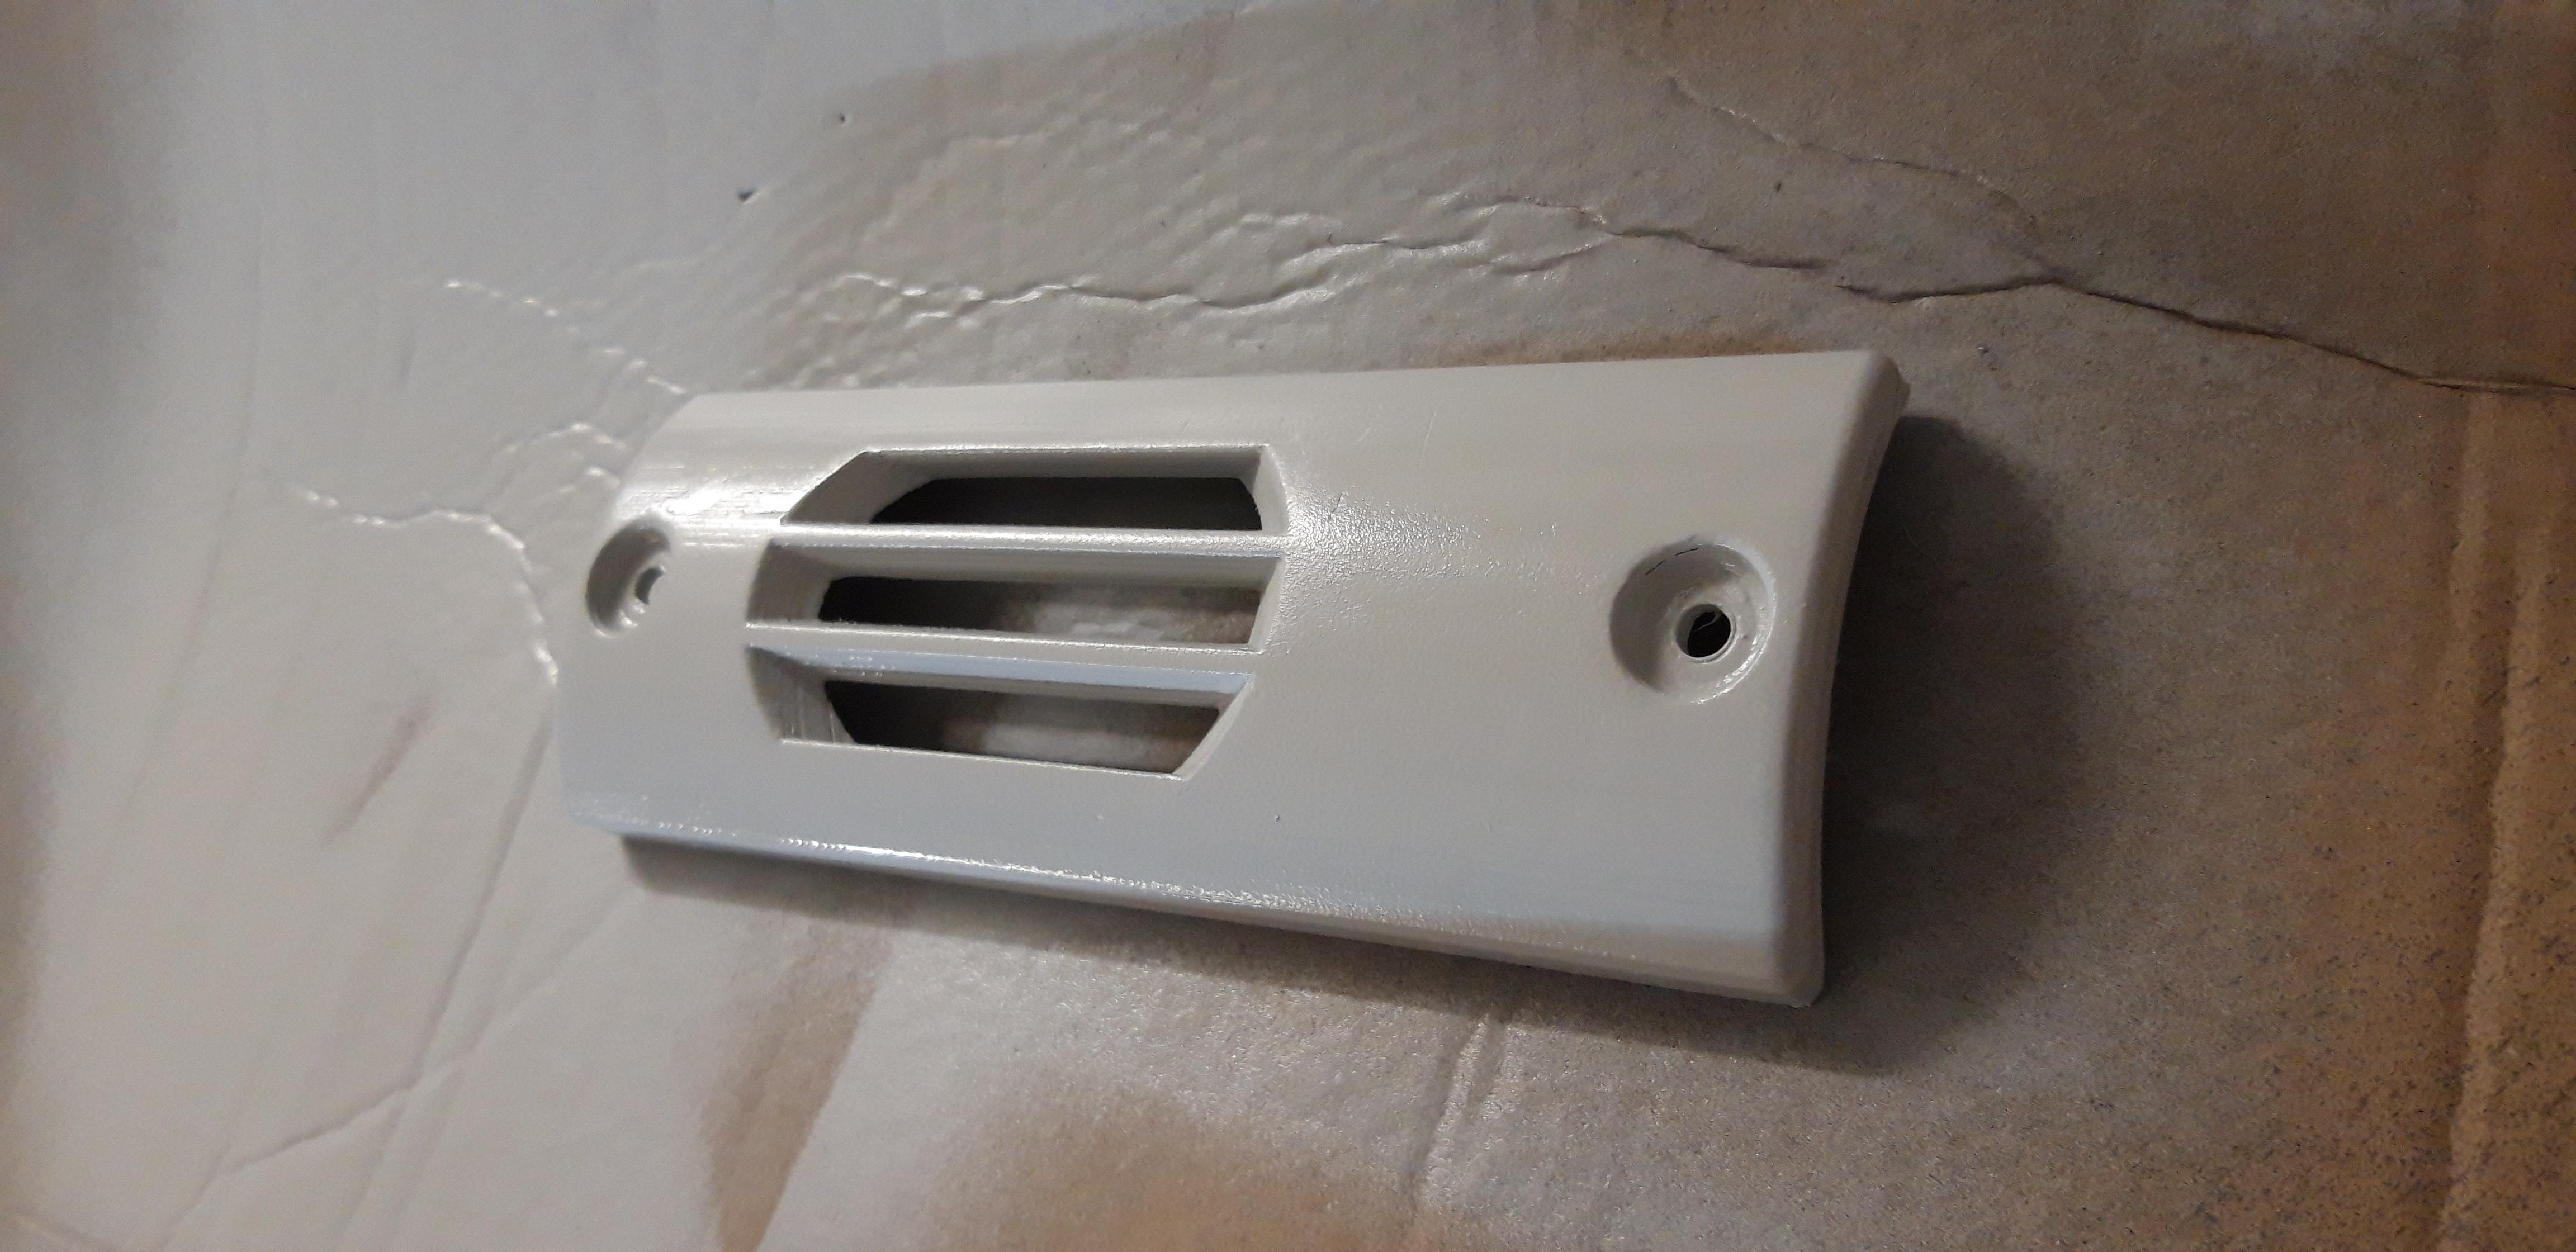 20200422_004316.jpg Download free STL file EXHAUST POT PLATE Booster Exhaust Plate • 3D printing object, Simonchantcliquet